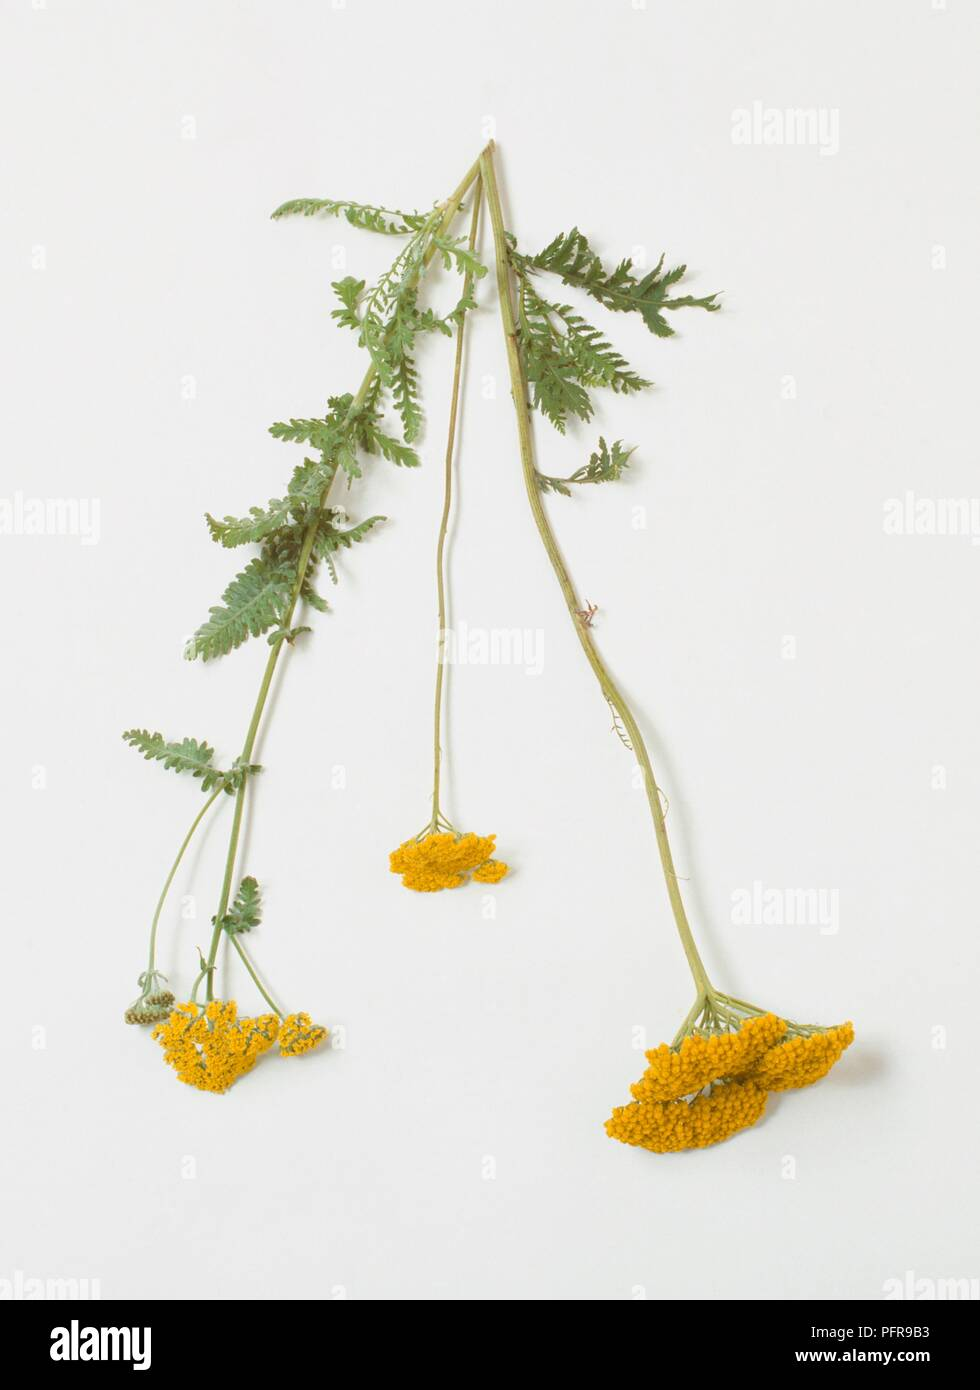 Achillea millefolium 'Moonshine' (Yarrow) with abundance of tiny yellow flowers and green leaves on long stem - Stock Image